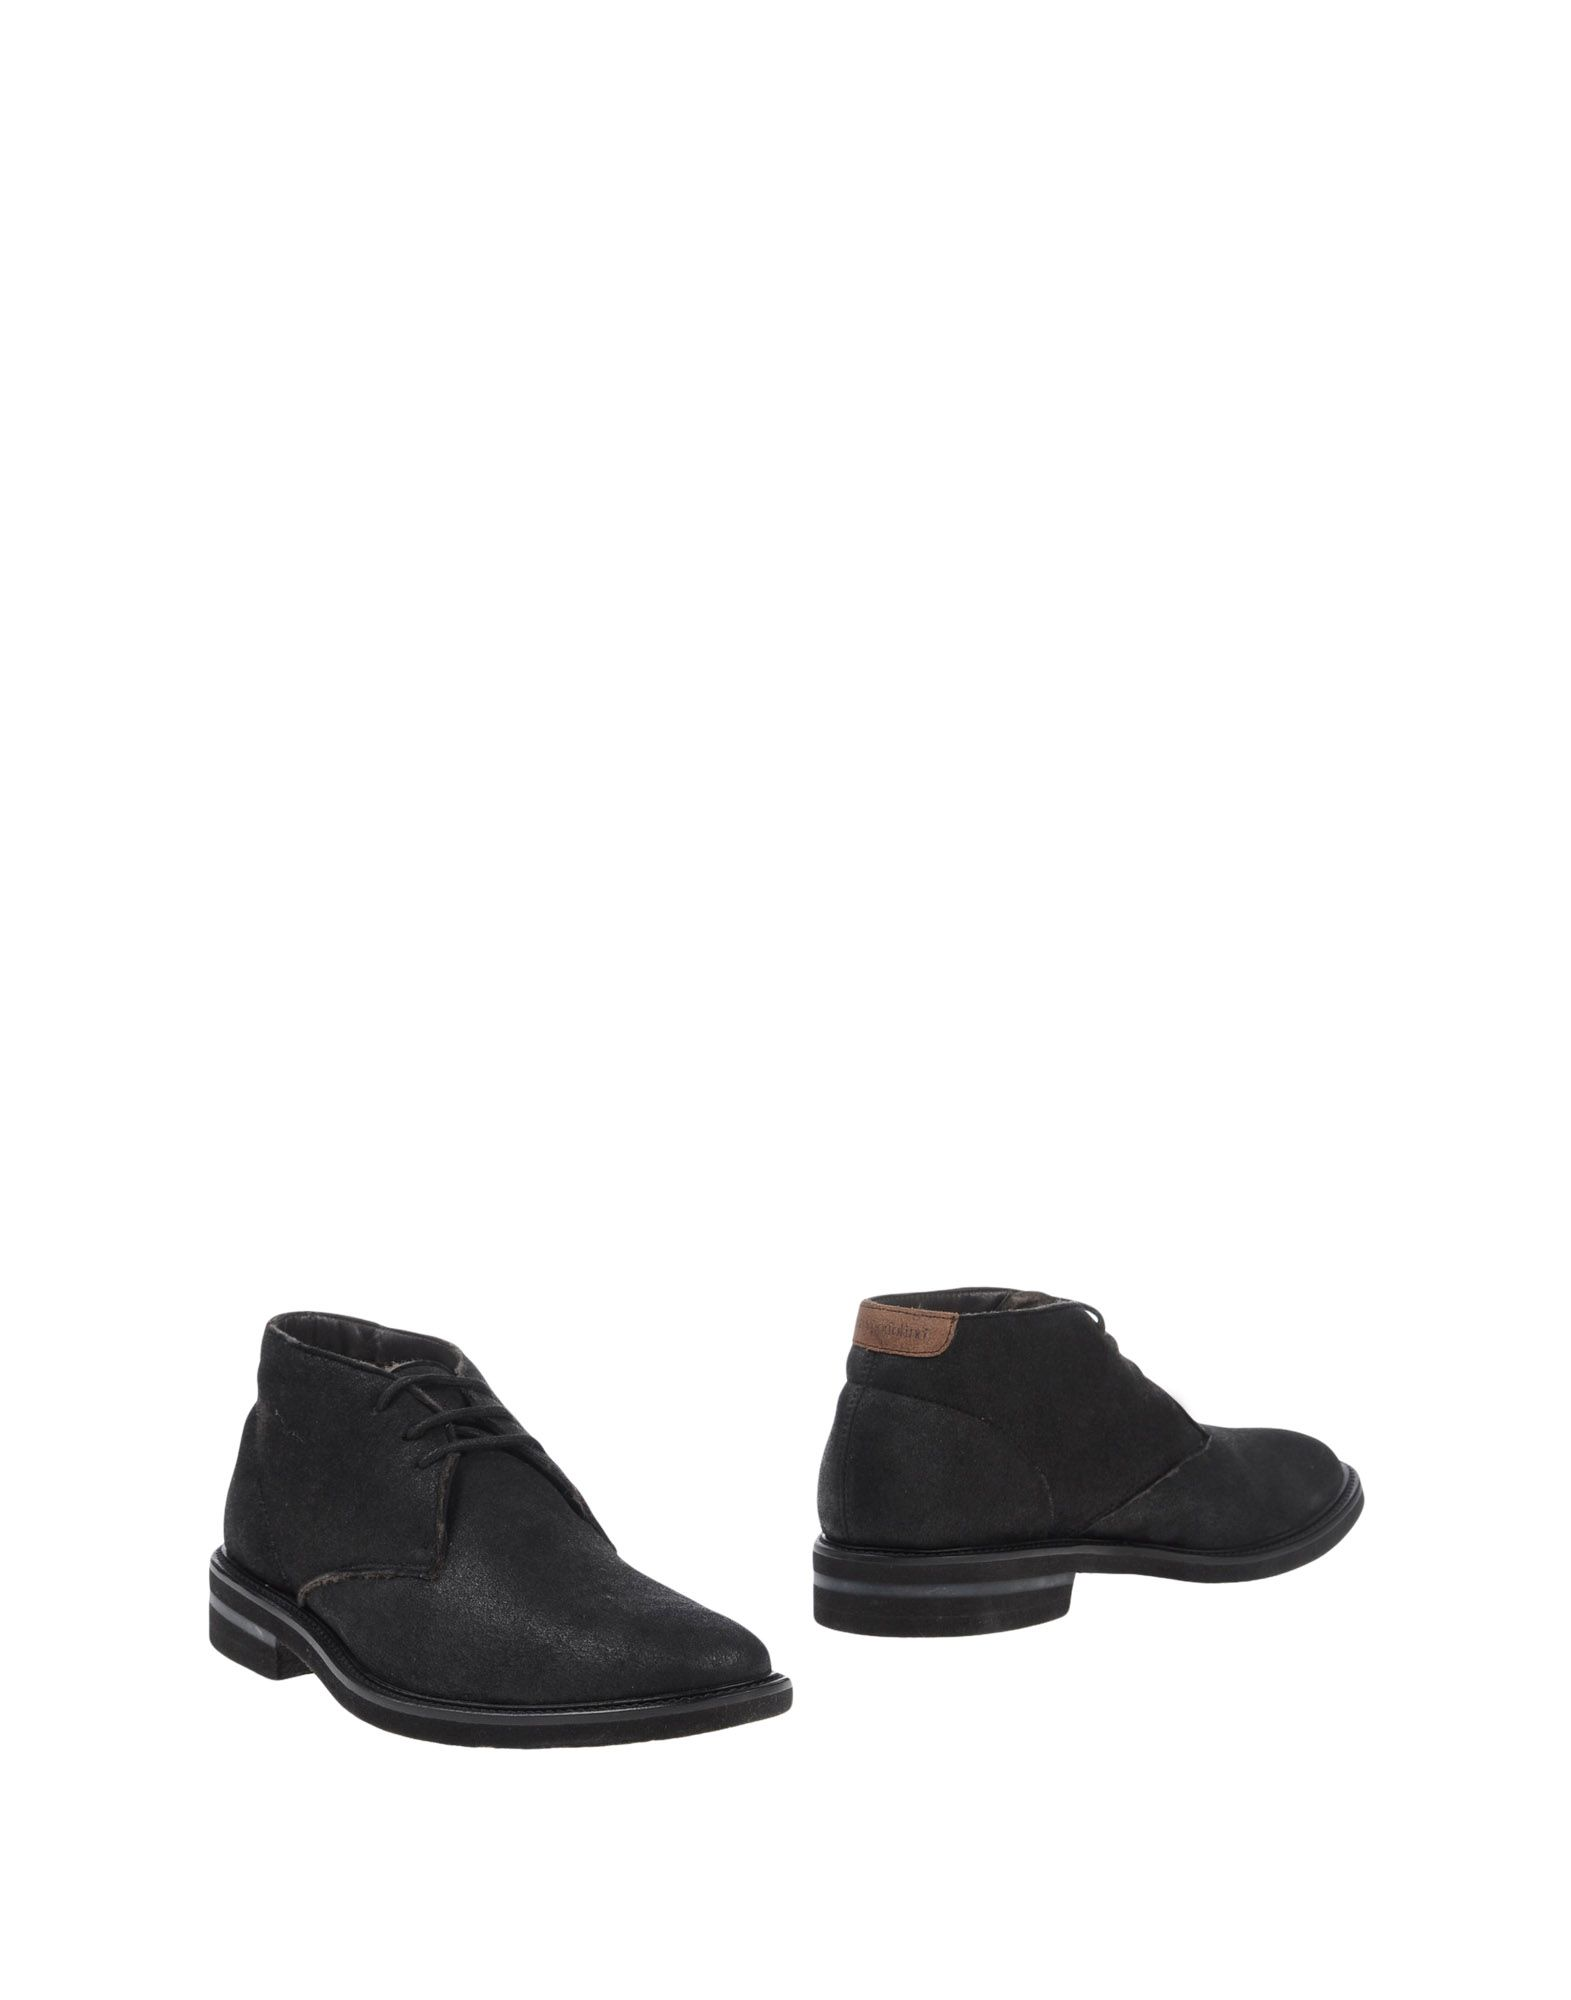 Gentryportofino Boots - Australia Men Gentryportofino Boots online on  Australia - - 11062608KU 66cbf4